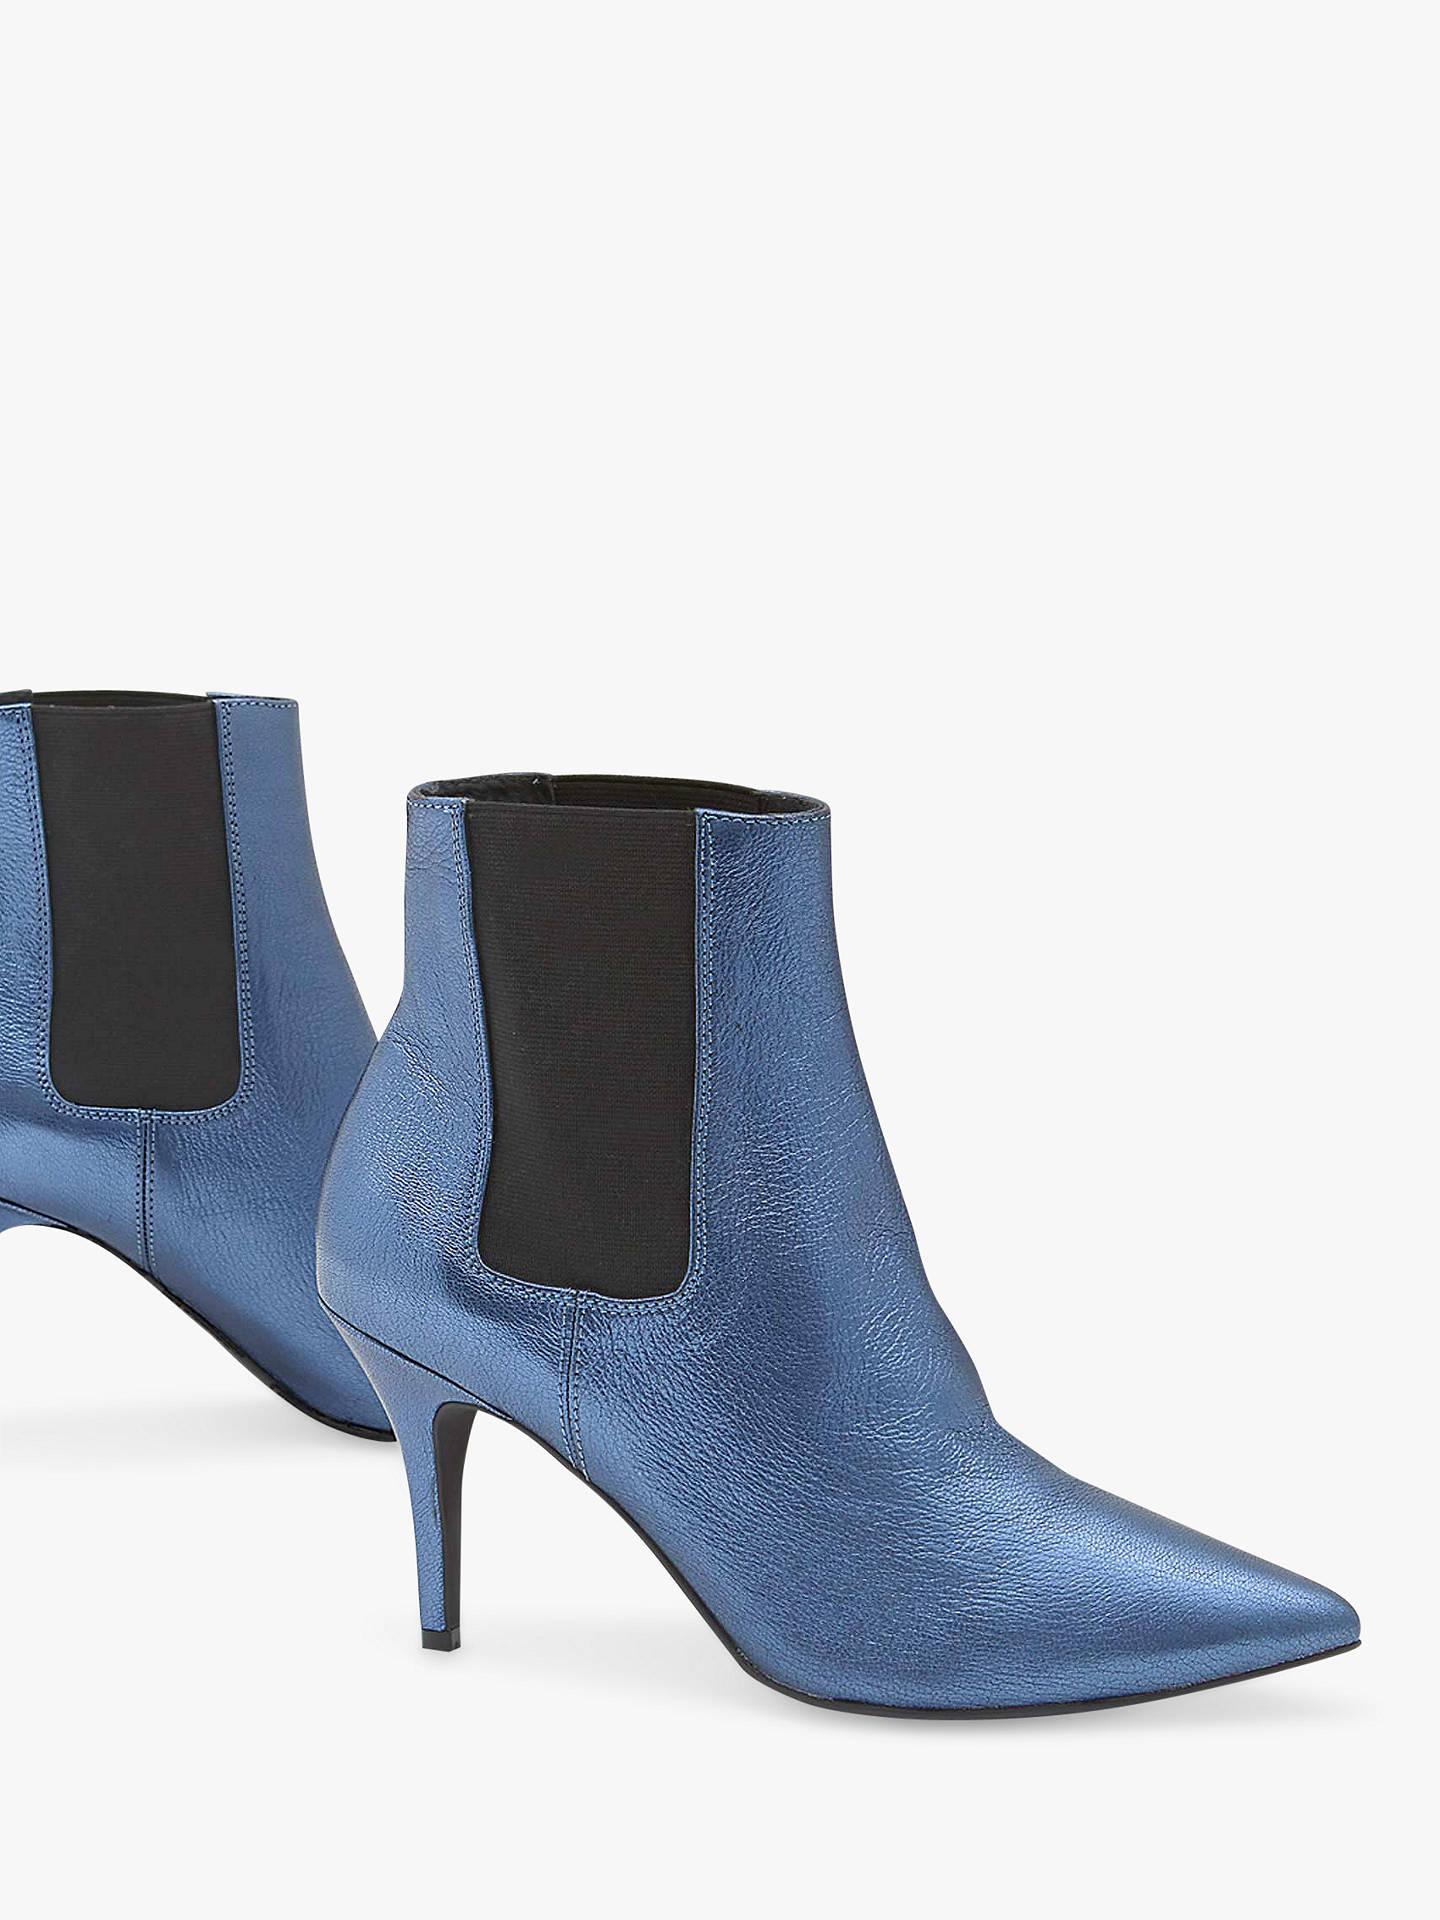 1dd735d92ef Mint Velvet Zara Metallic Leather Stiletto Heel Ankle Boots at John ...